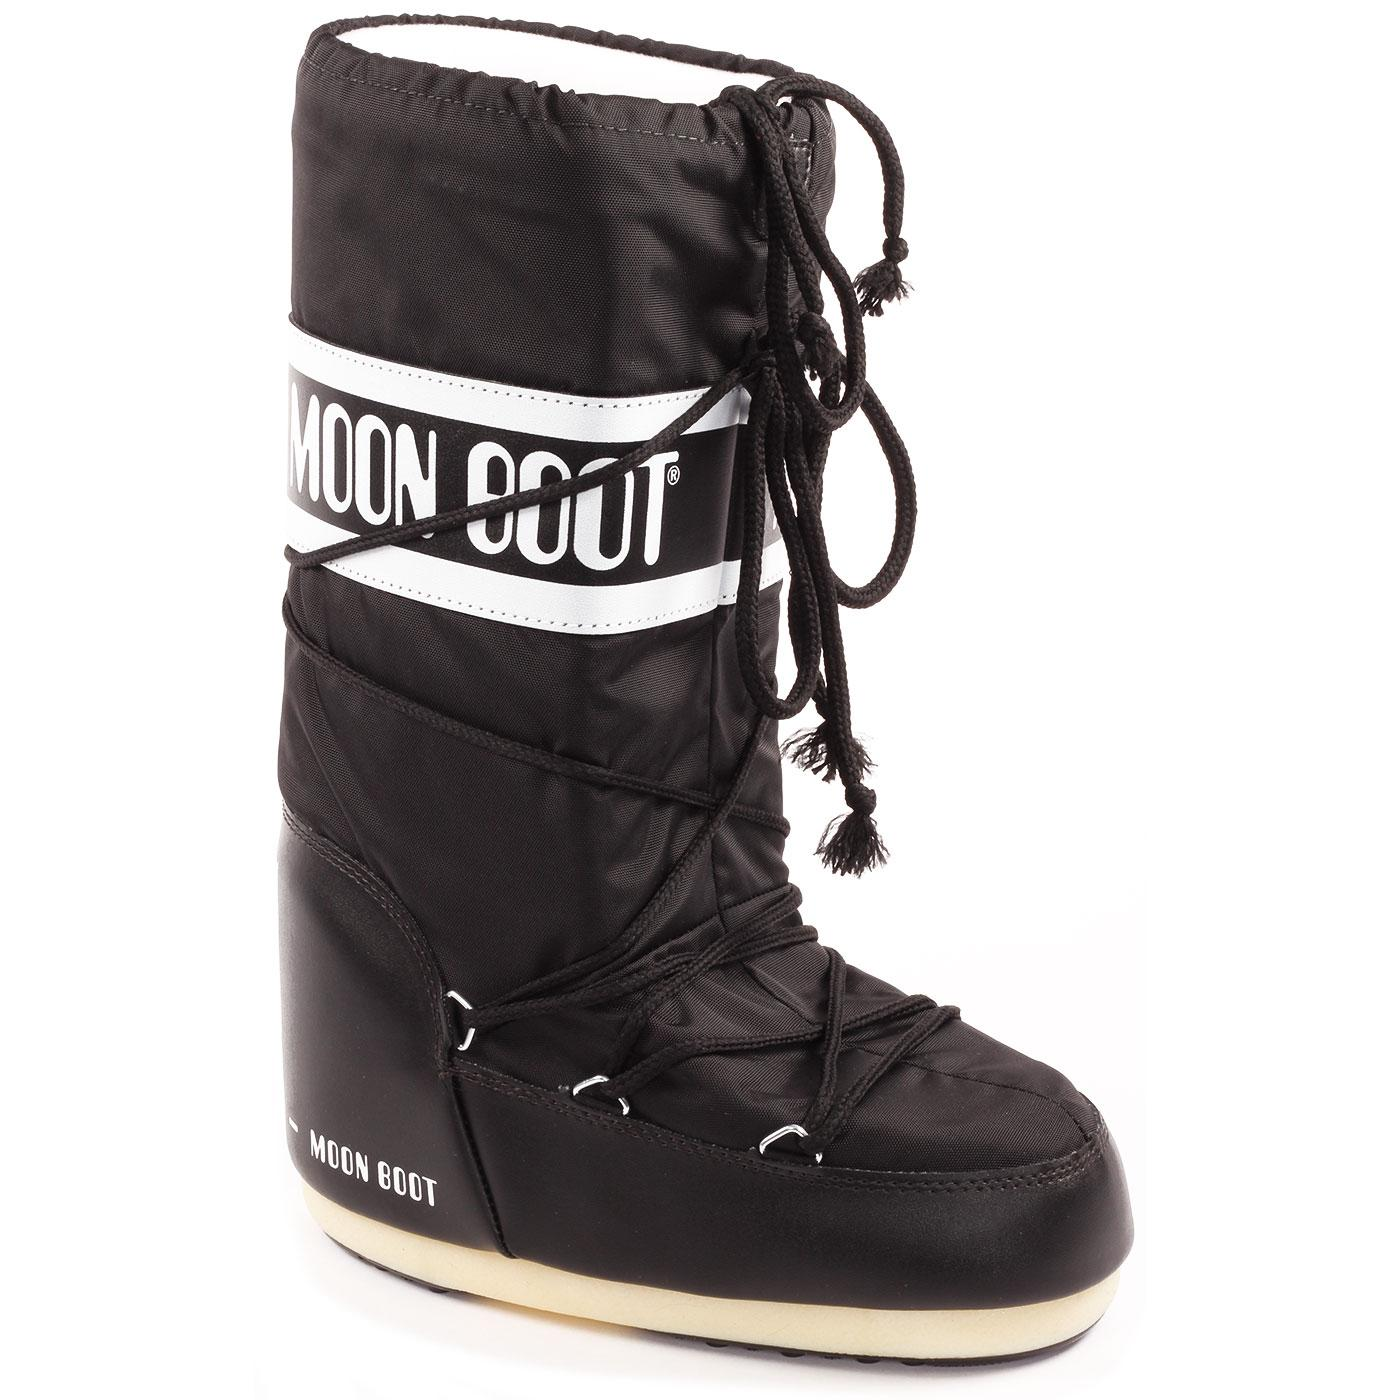 ORIGINAL MOON BOOT Classic Retro 70s Snow Boots B